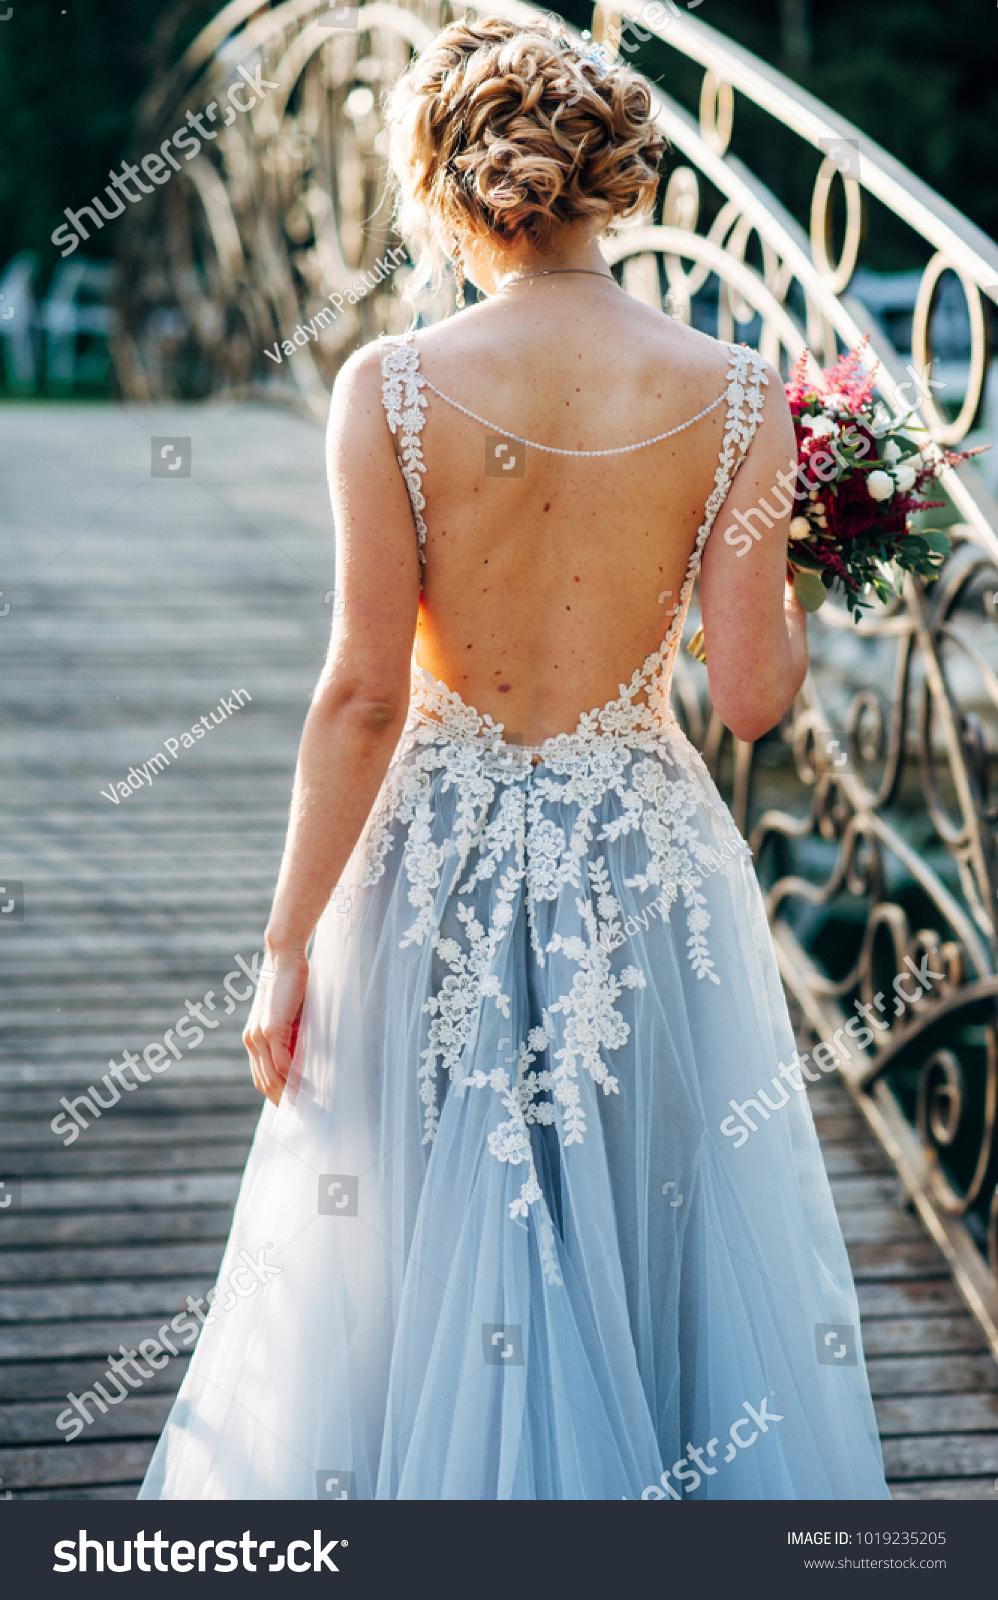 Bride Walking Across Bridge Grey Wedding Stock Photo (Edit Now ...